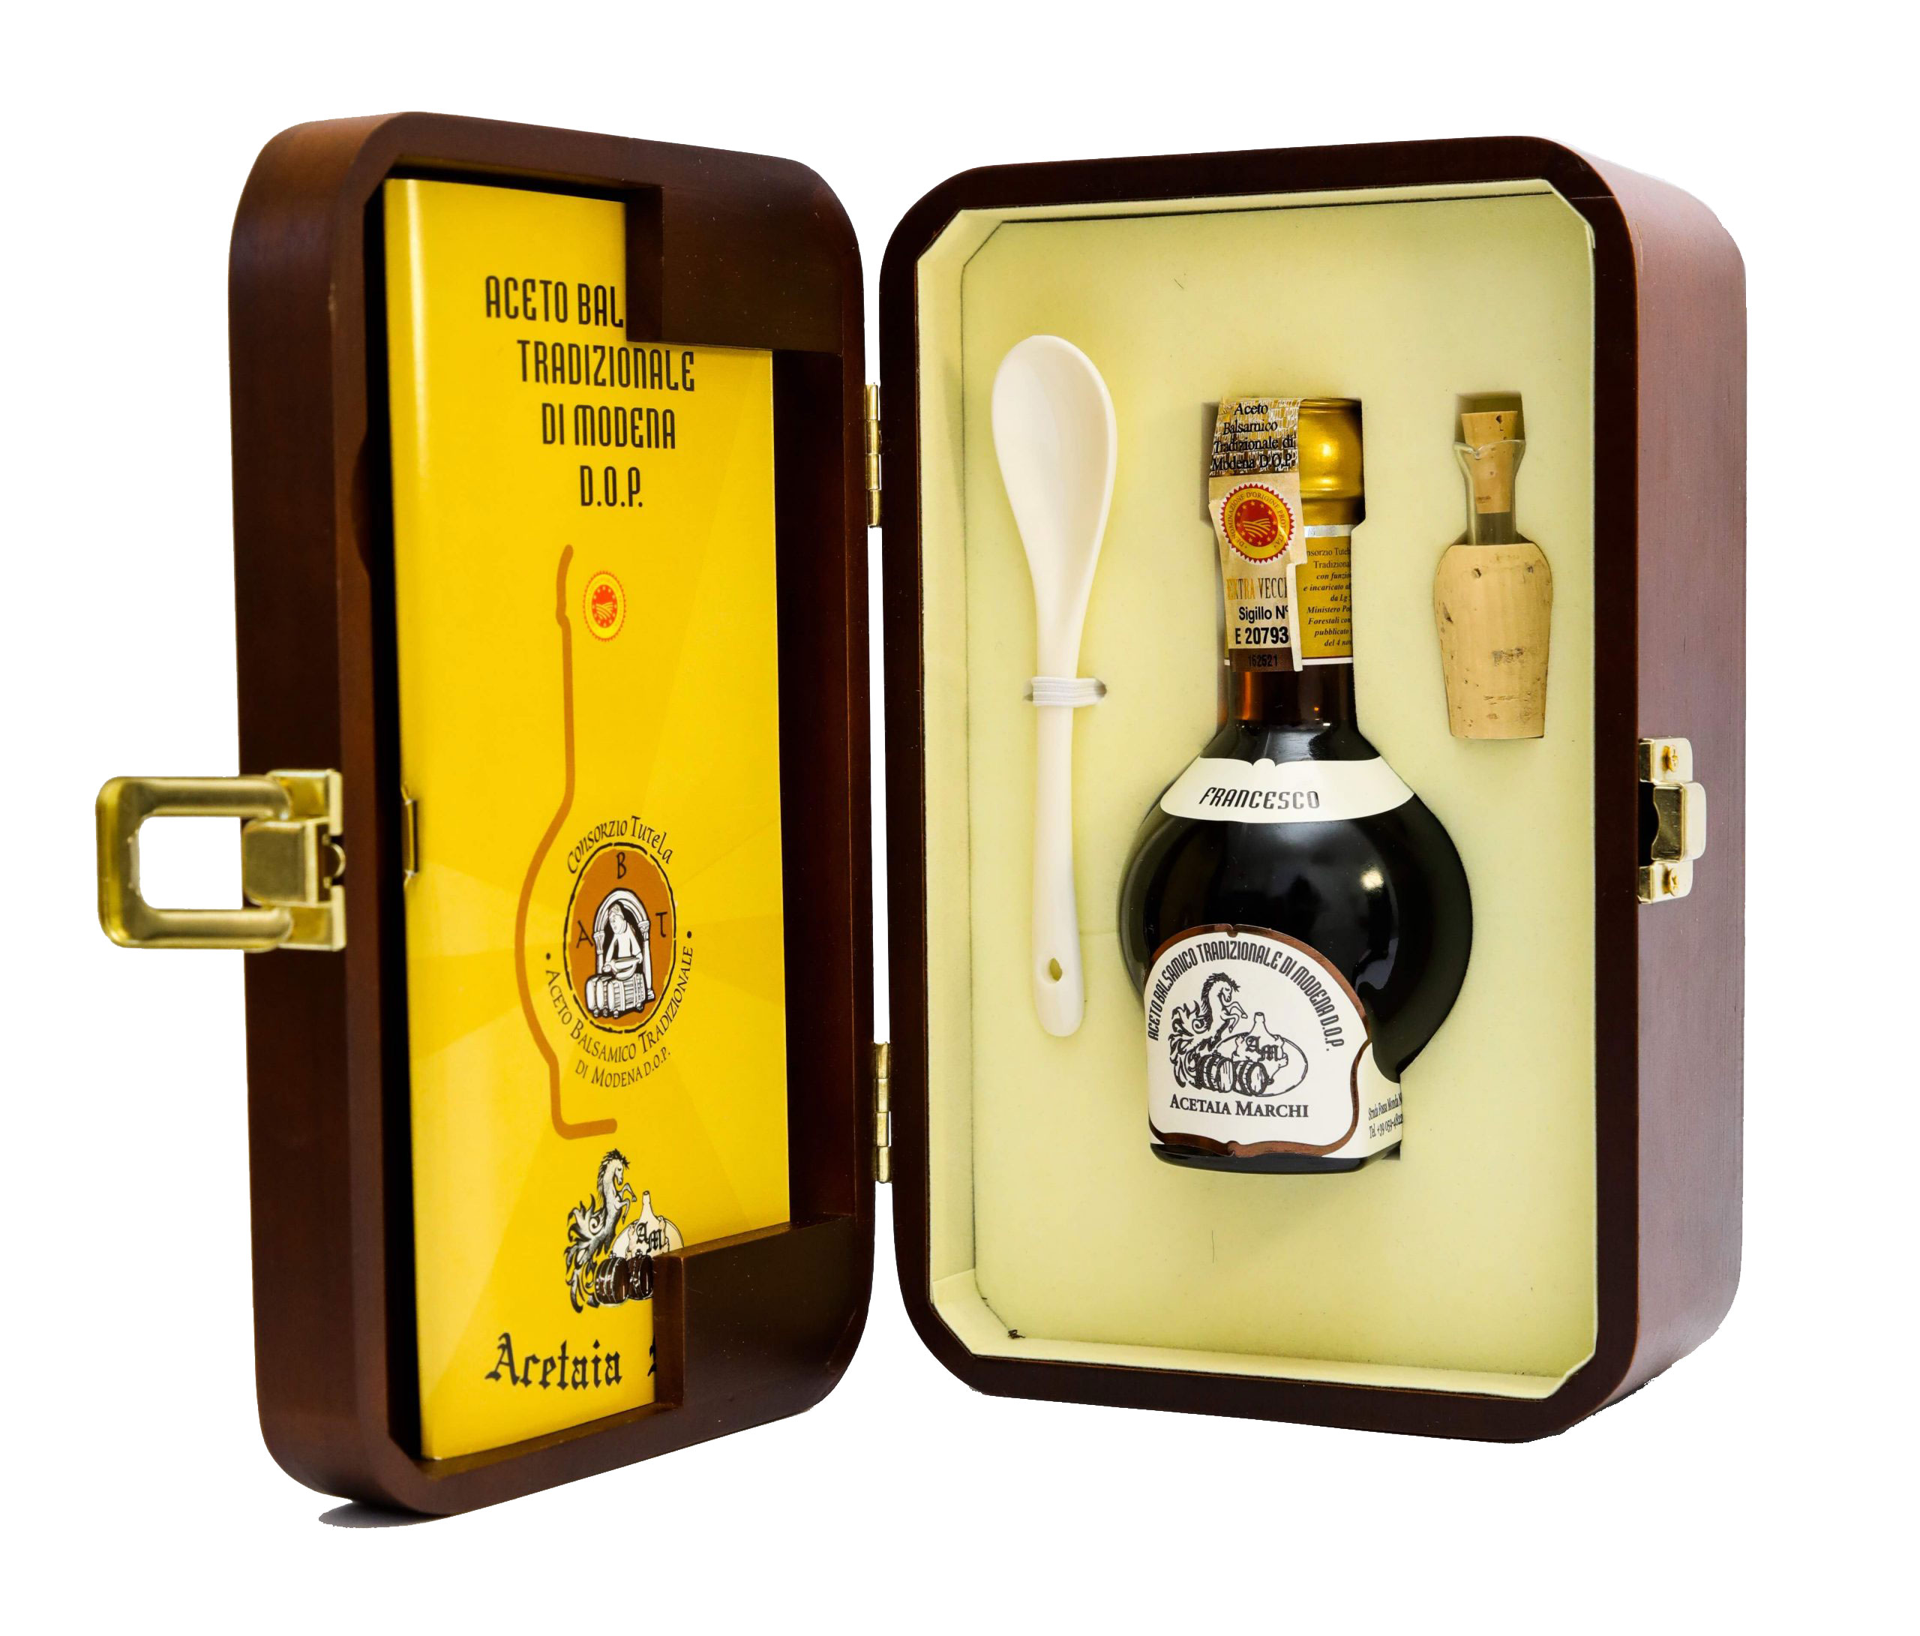 traditional-balsamic-vinegar-of-modena-dop-extravecchio-francesco-wood-box